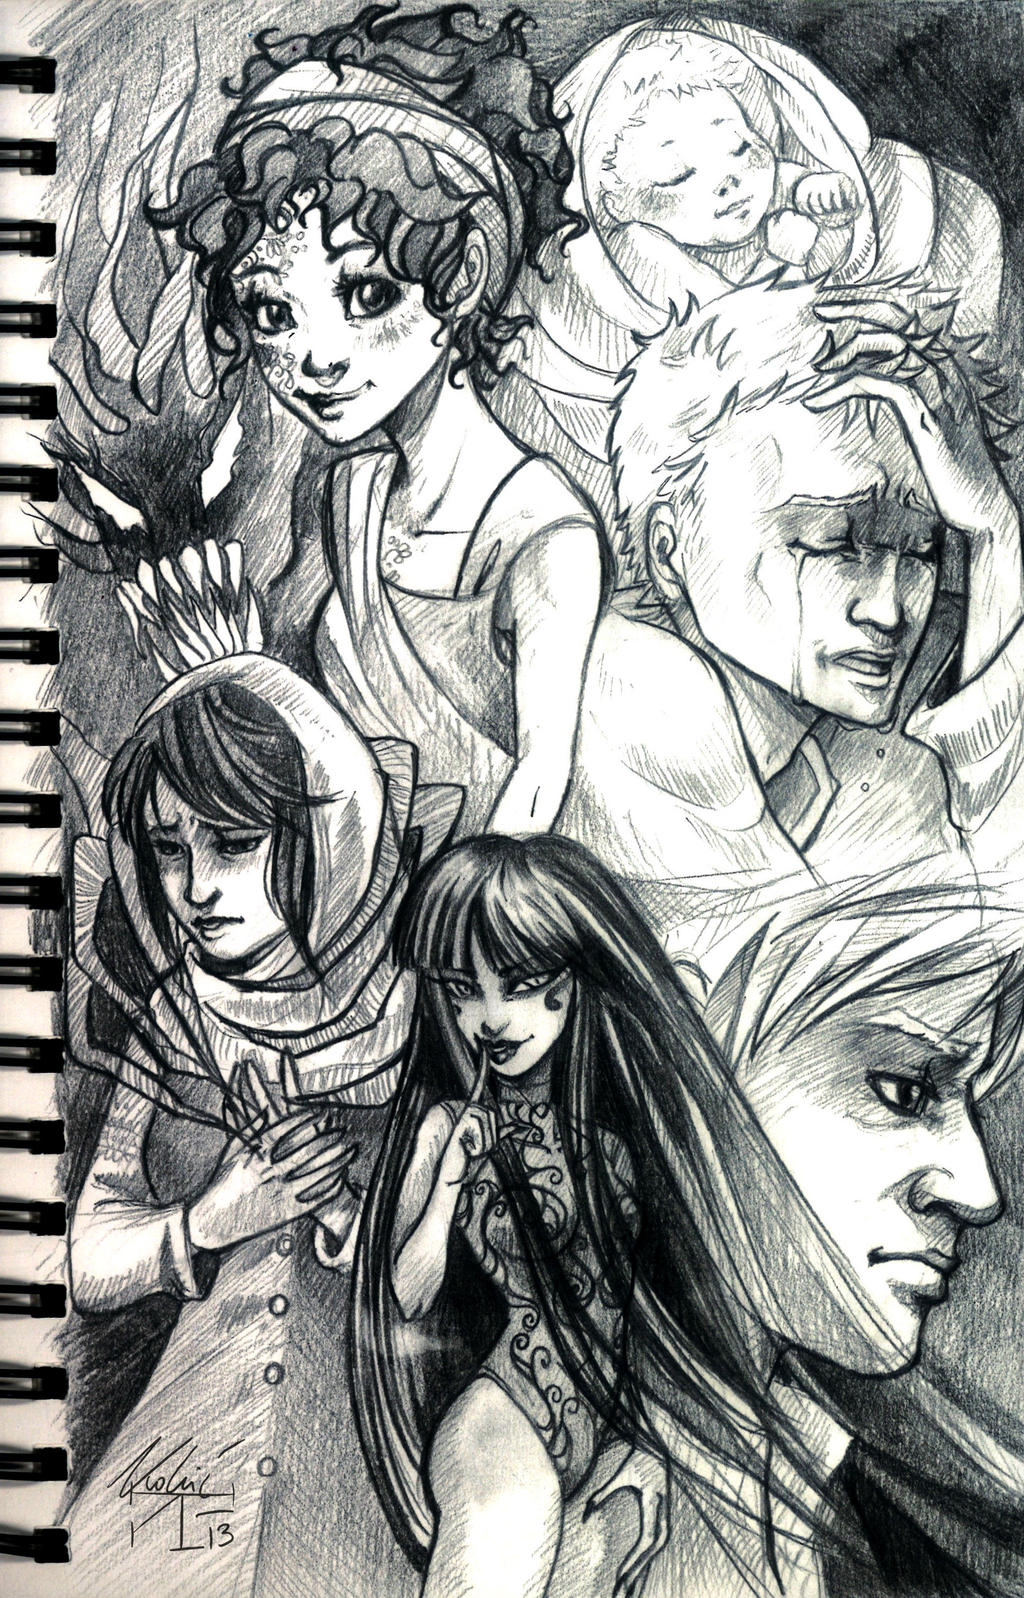 Despair by Idolum